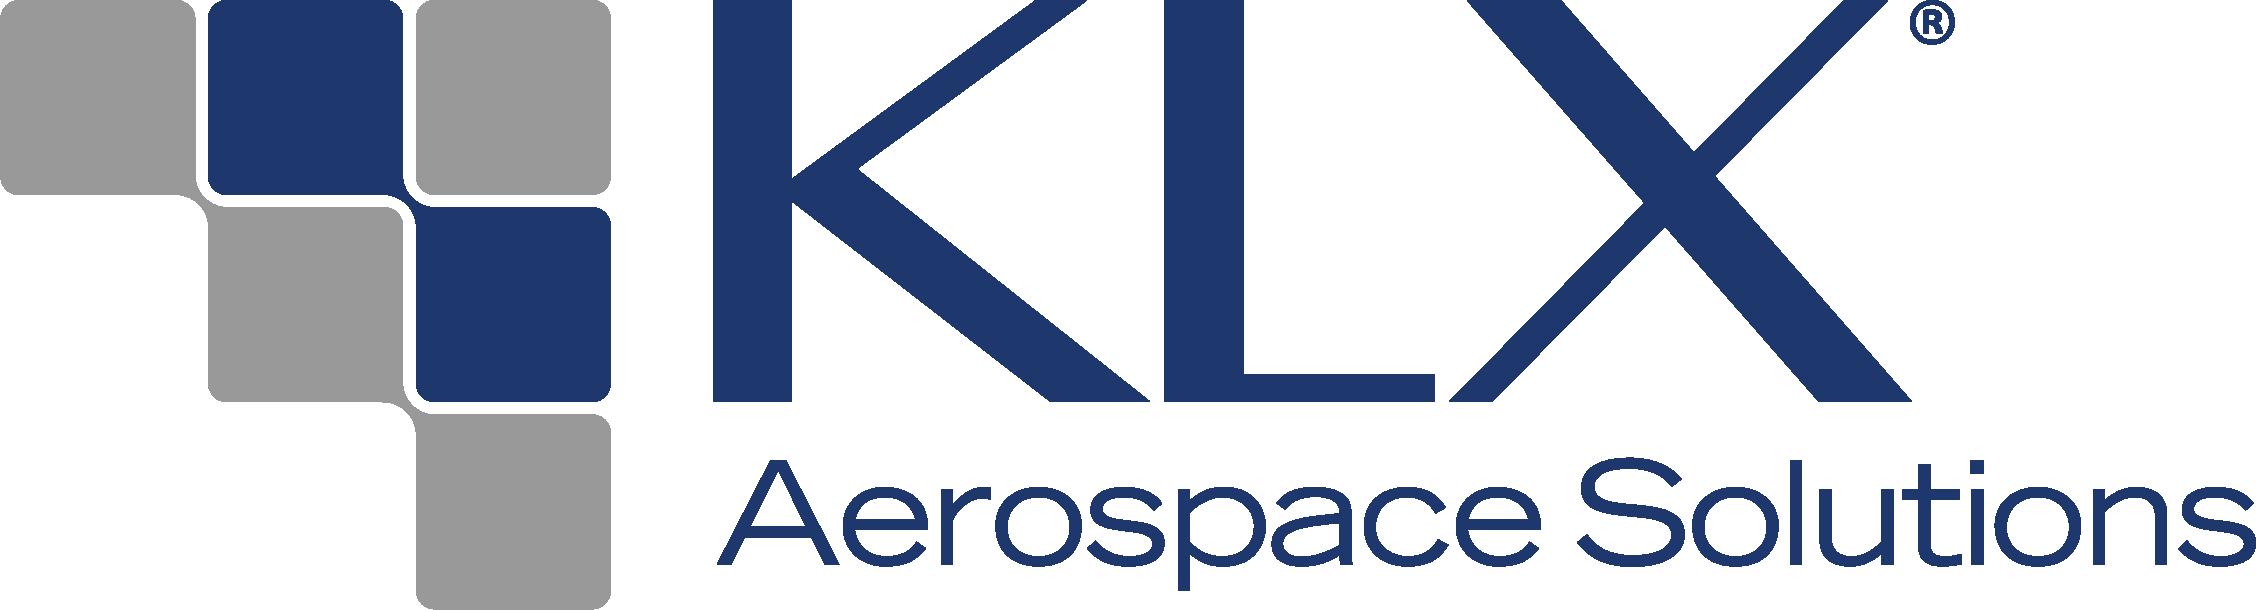 Download Logo - Klx Aerospace Logo - Full Size PNG Image - PNGkit